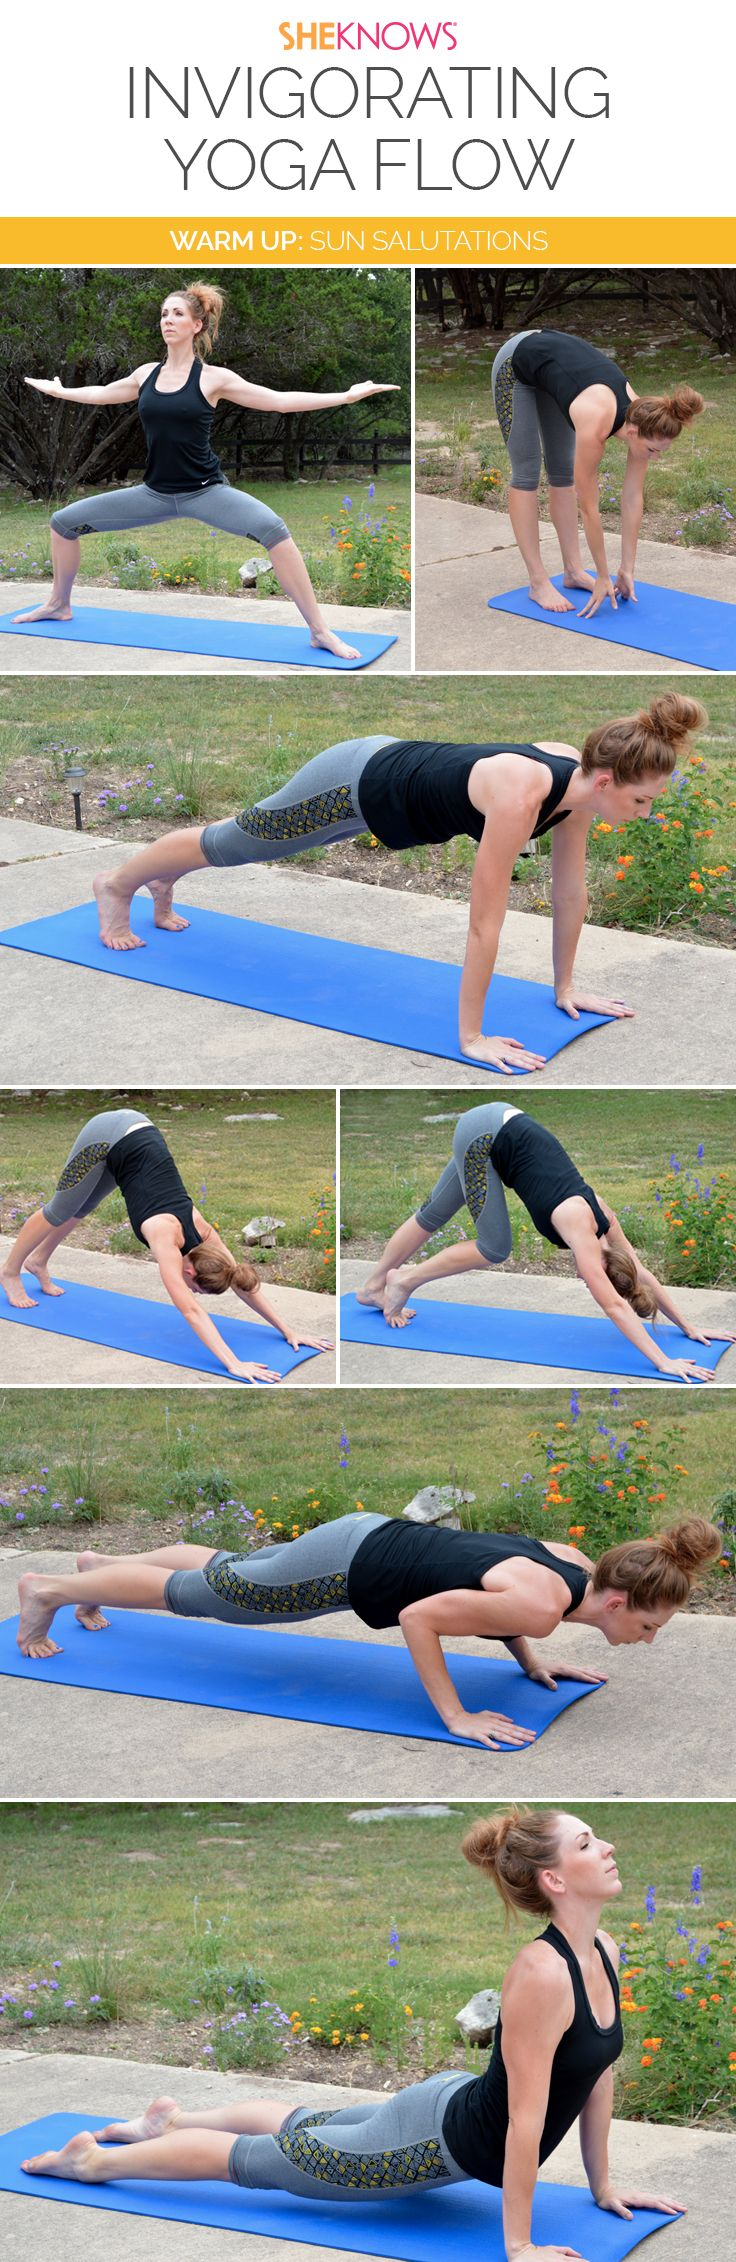 best yoga images on pinterest